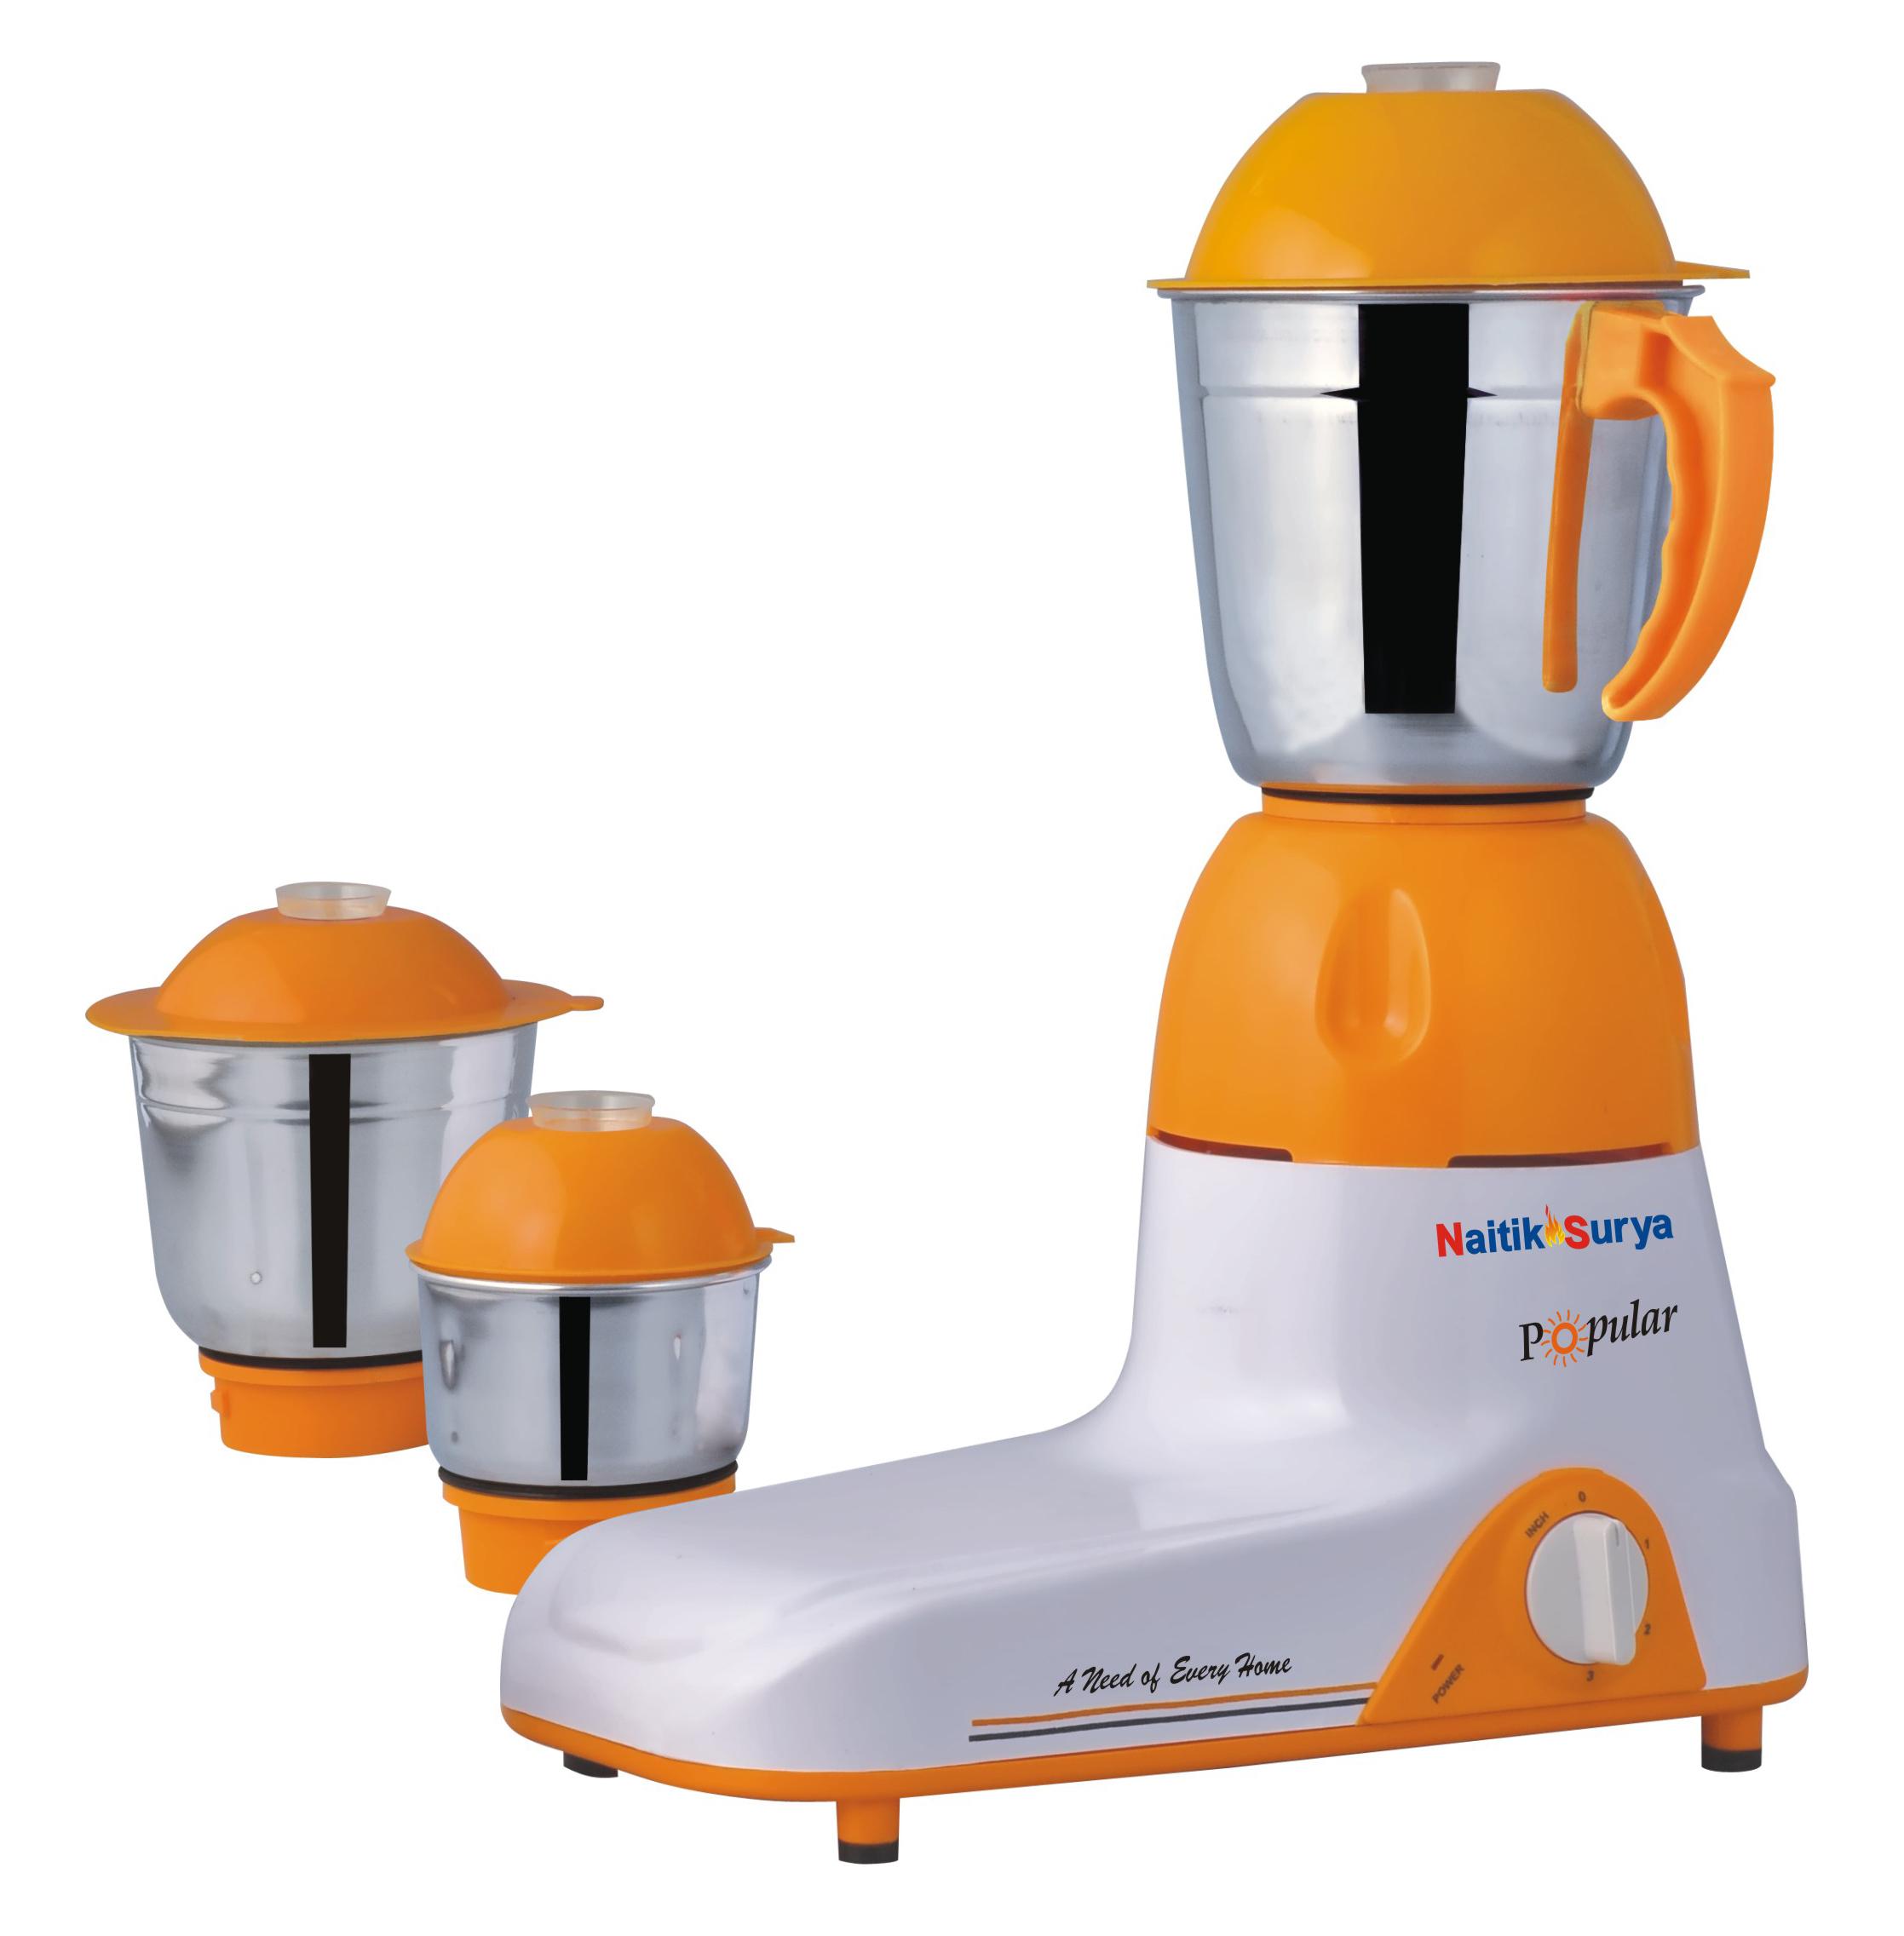 Naitiksurya Mixer Grinder 3jar 750 Watts Balano